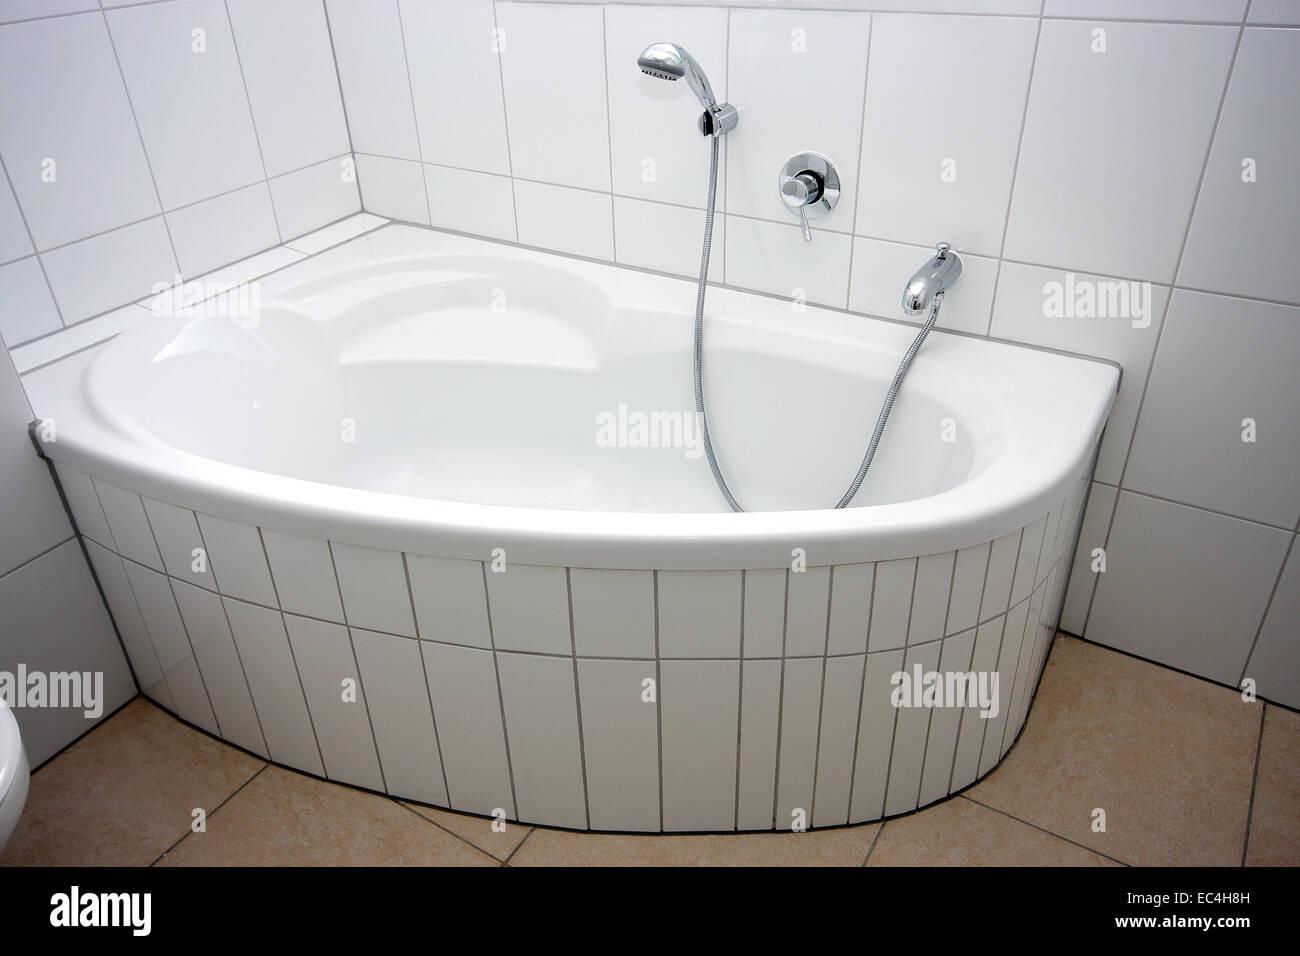 Vasca Da Bagno Angolare 130x130 : Vasca angolare vasca angolare riferimento di mobili casa